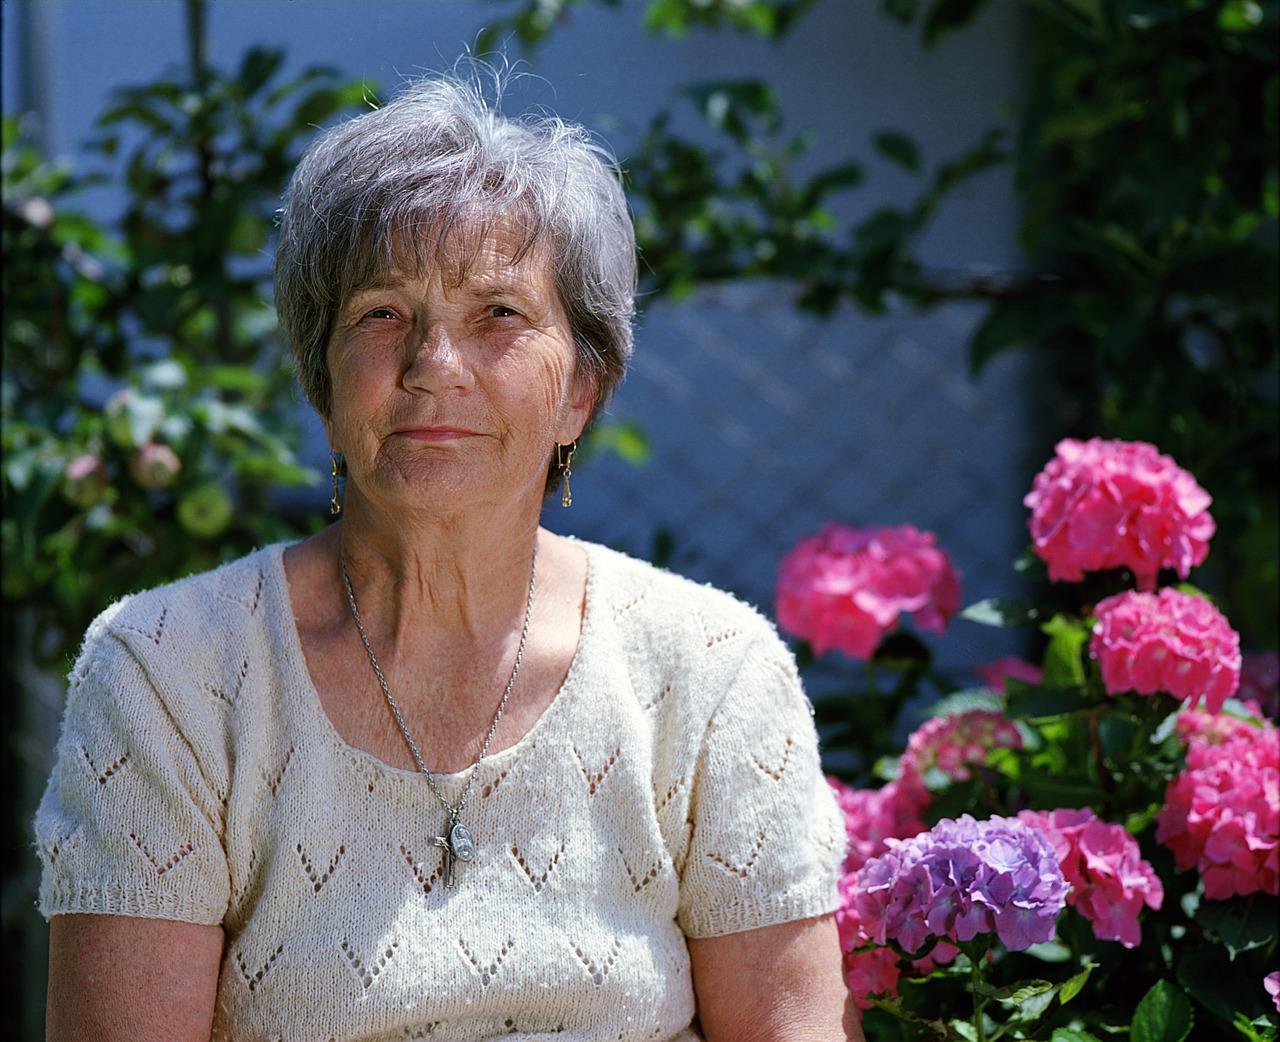 woman-older